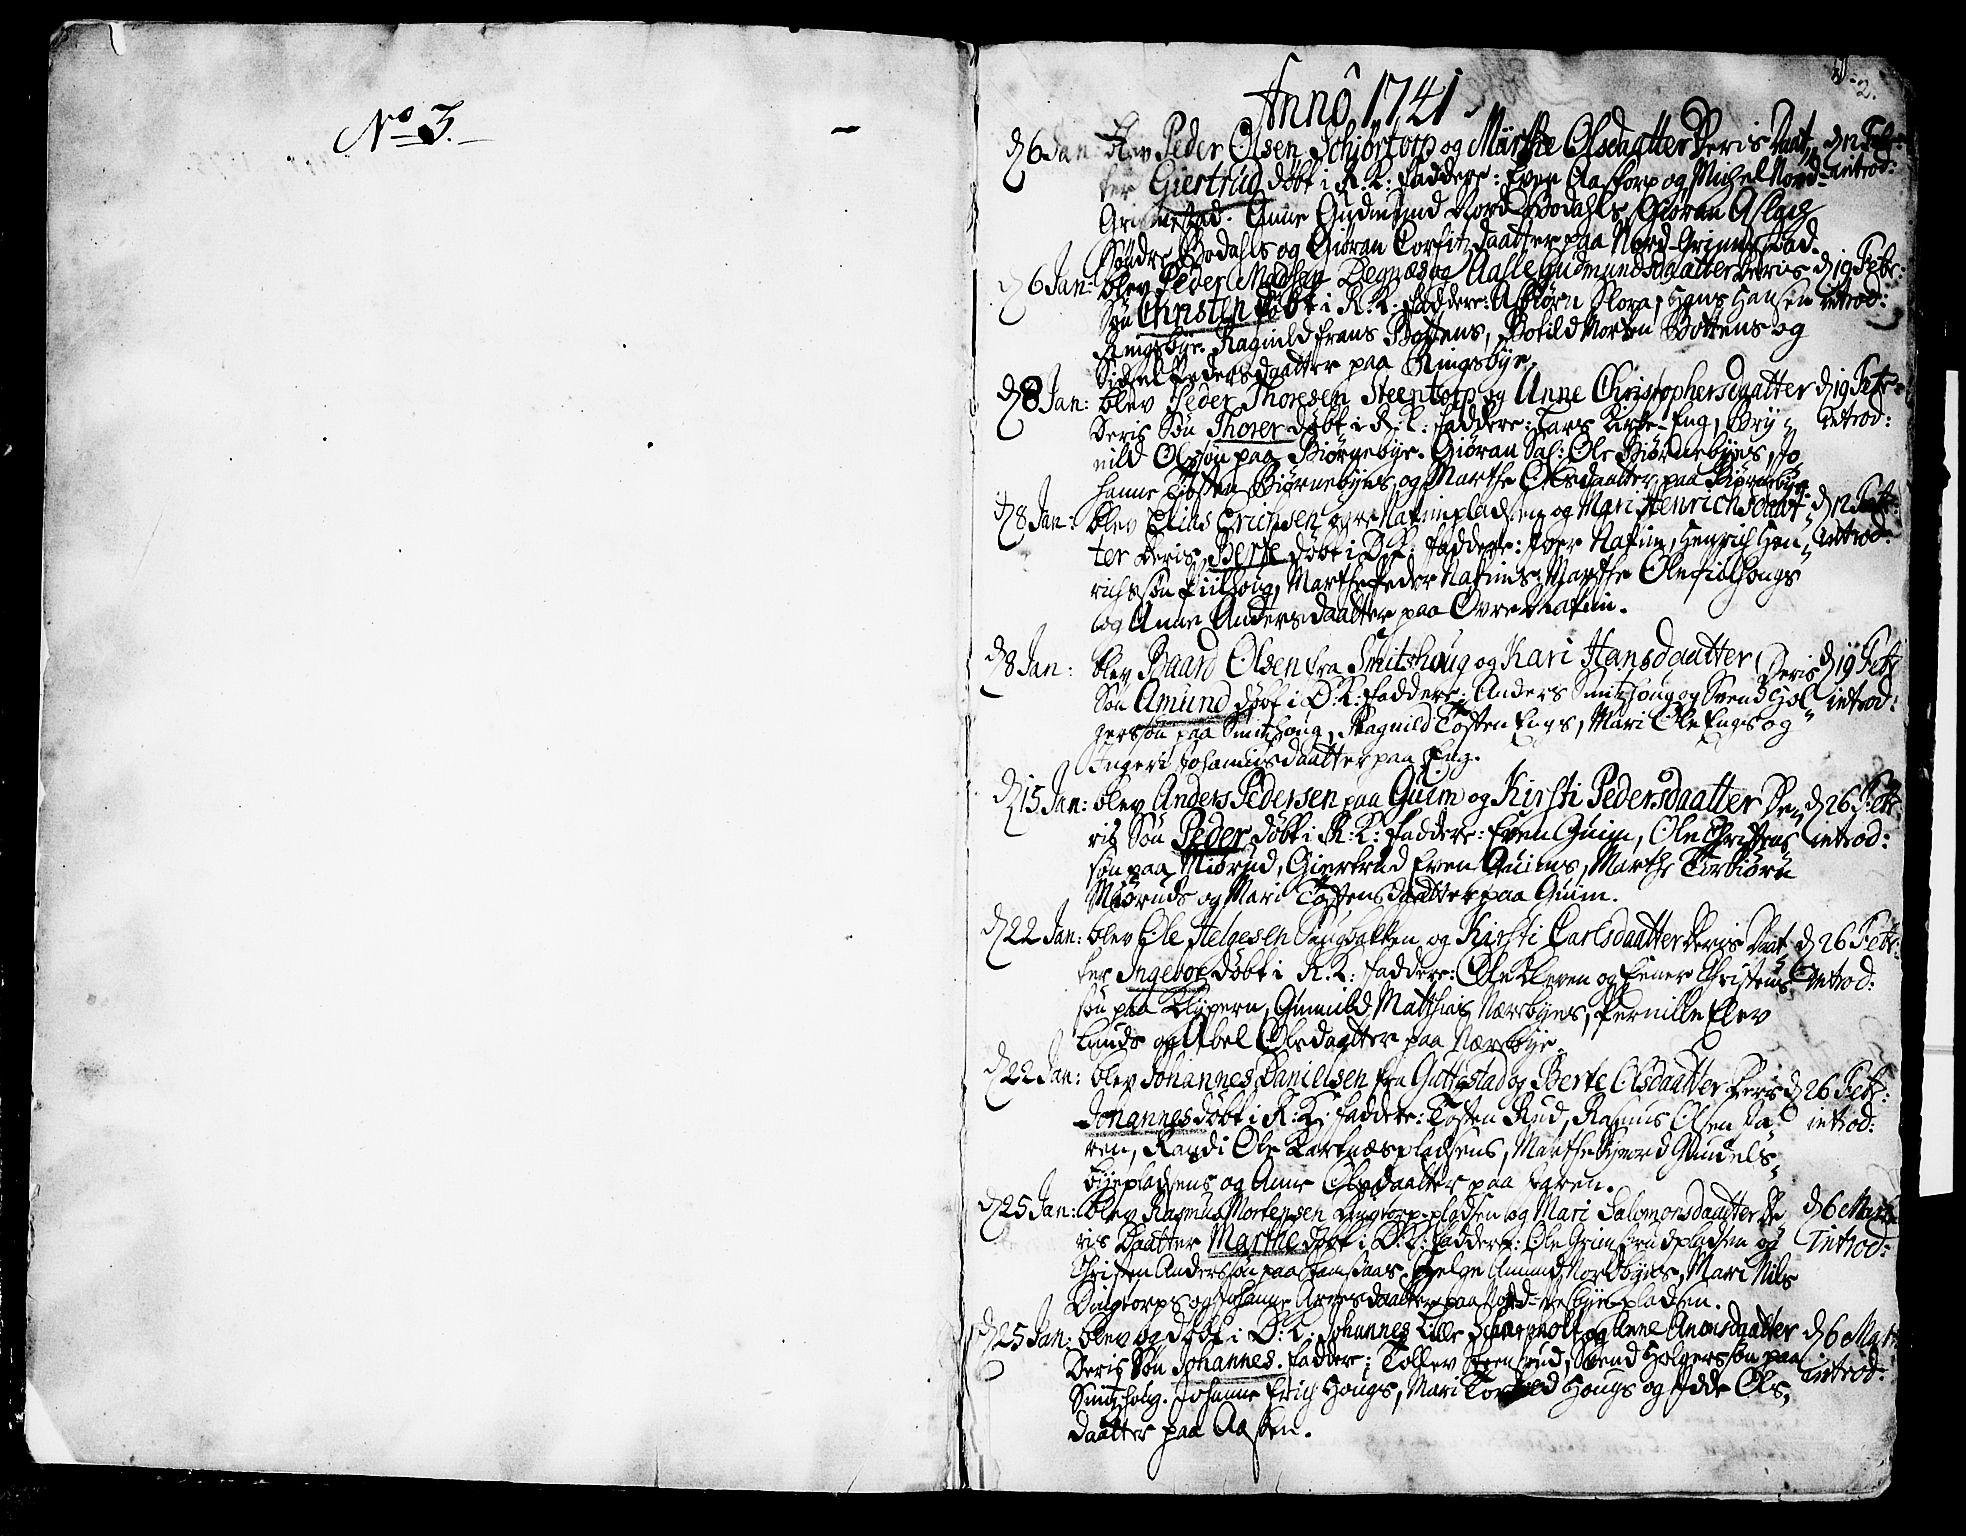 SAO, Rakkestad prestekontor Kirkebøker, F/Fa/L0002: Parish register (official) no. I 2, 1741-1751, p. 2